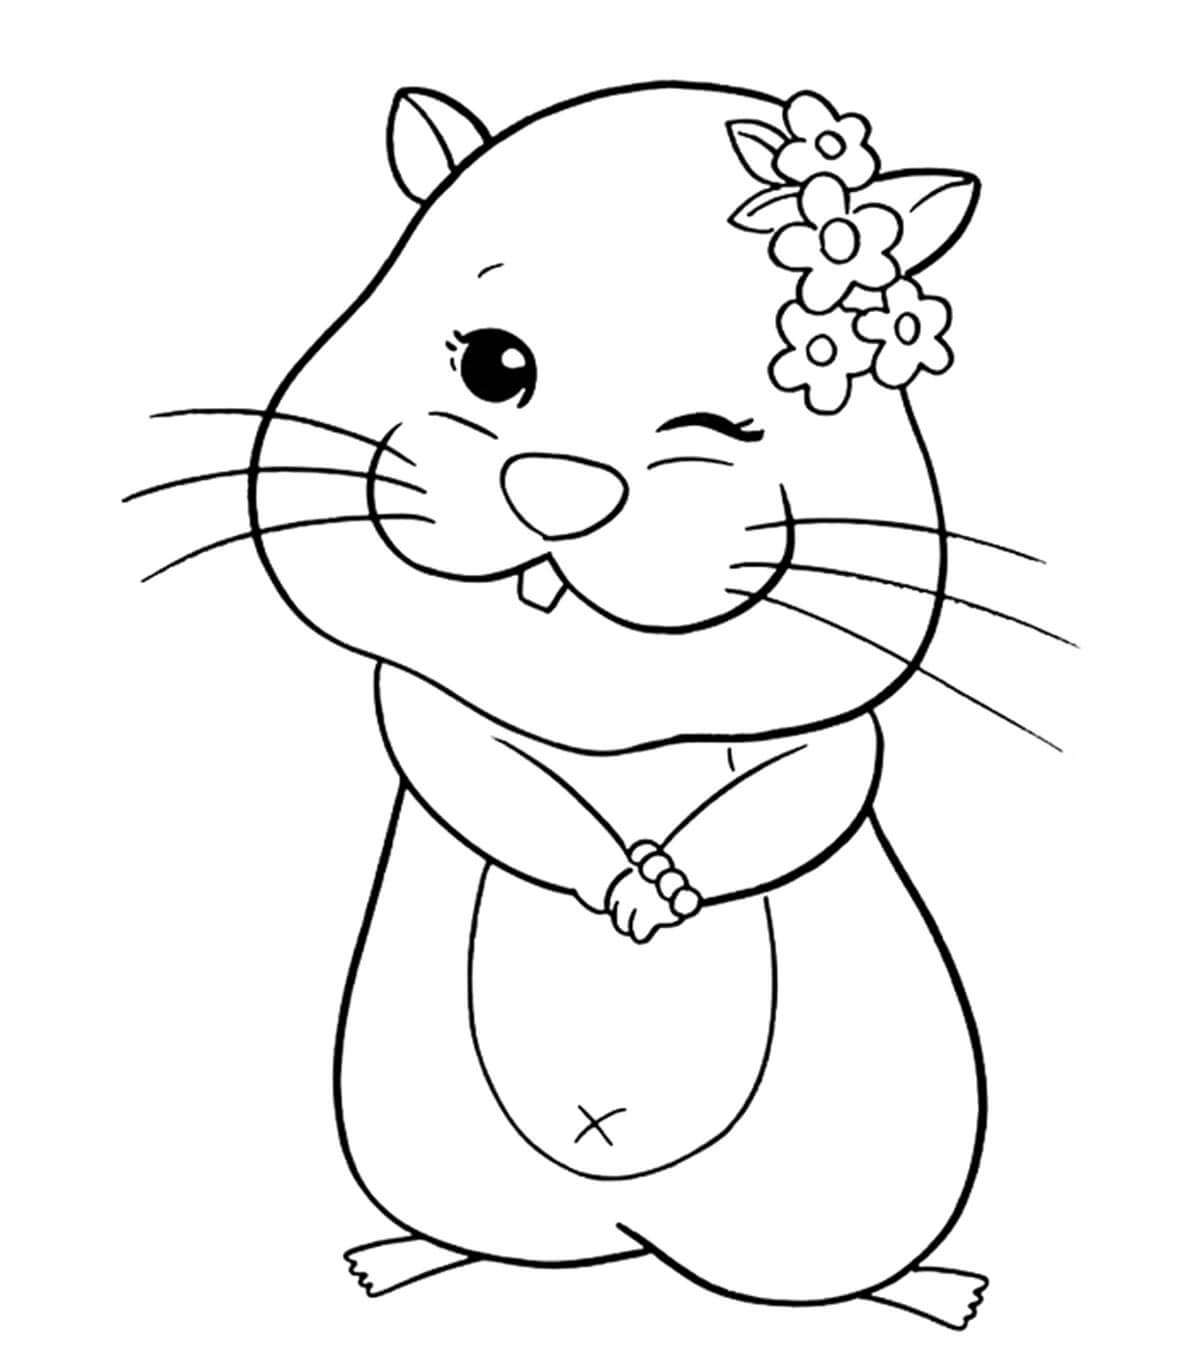 Desenhos de Hamster Engraçado para colorir